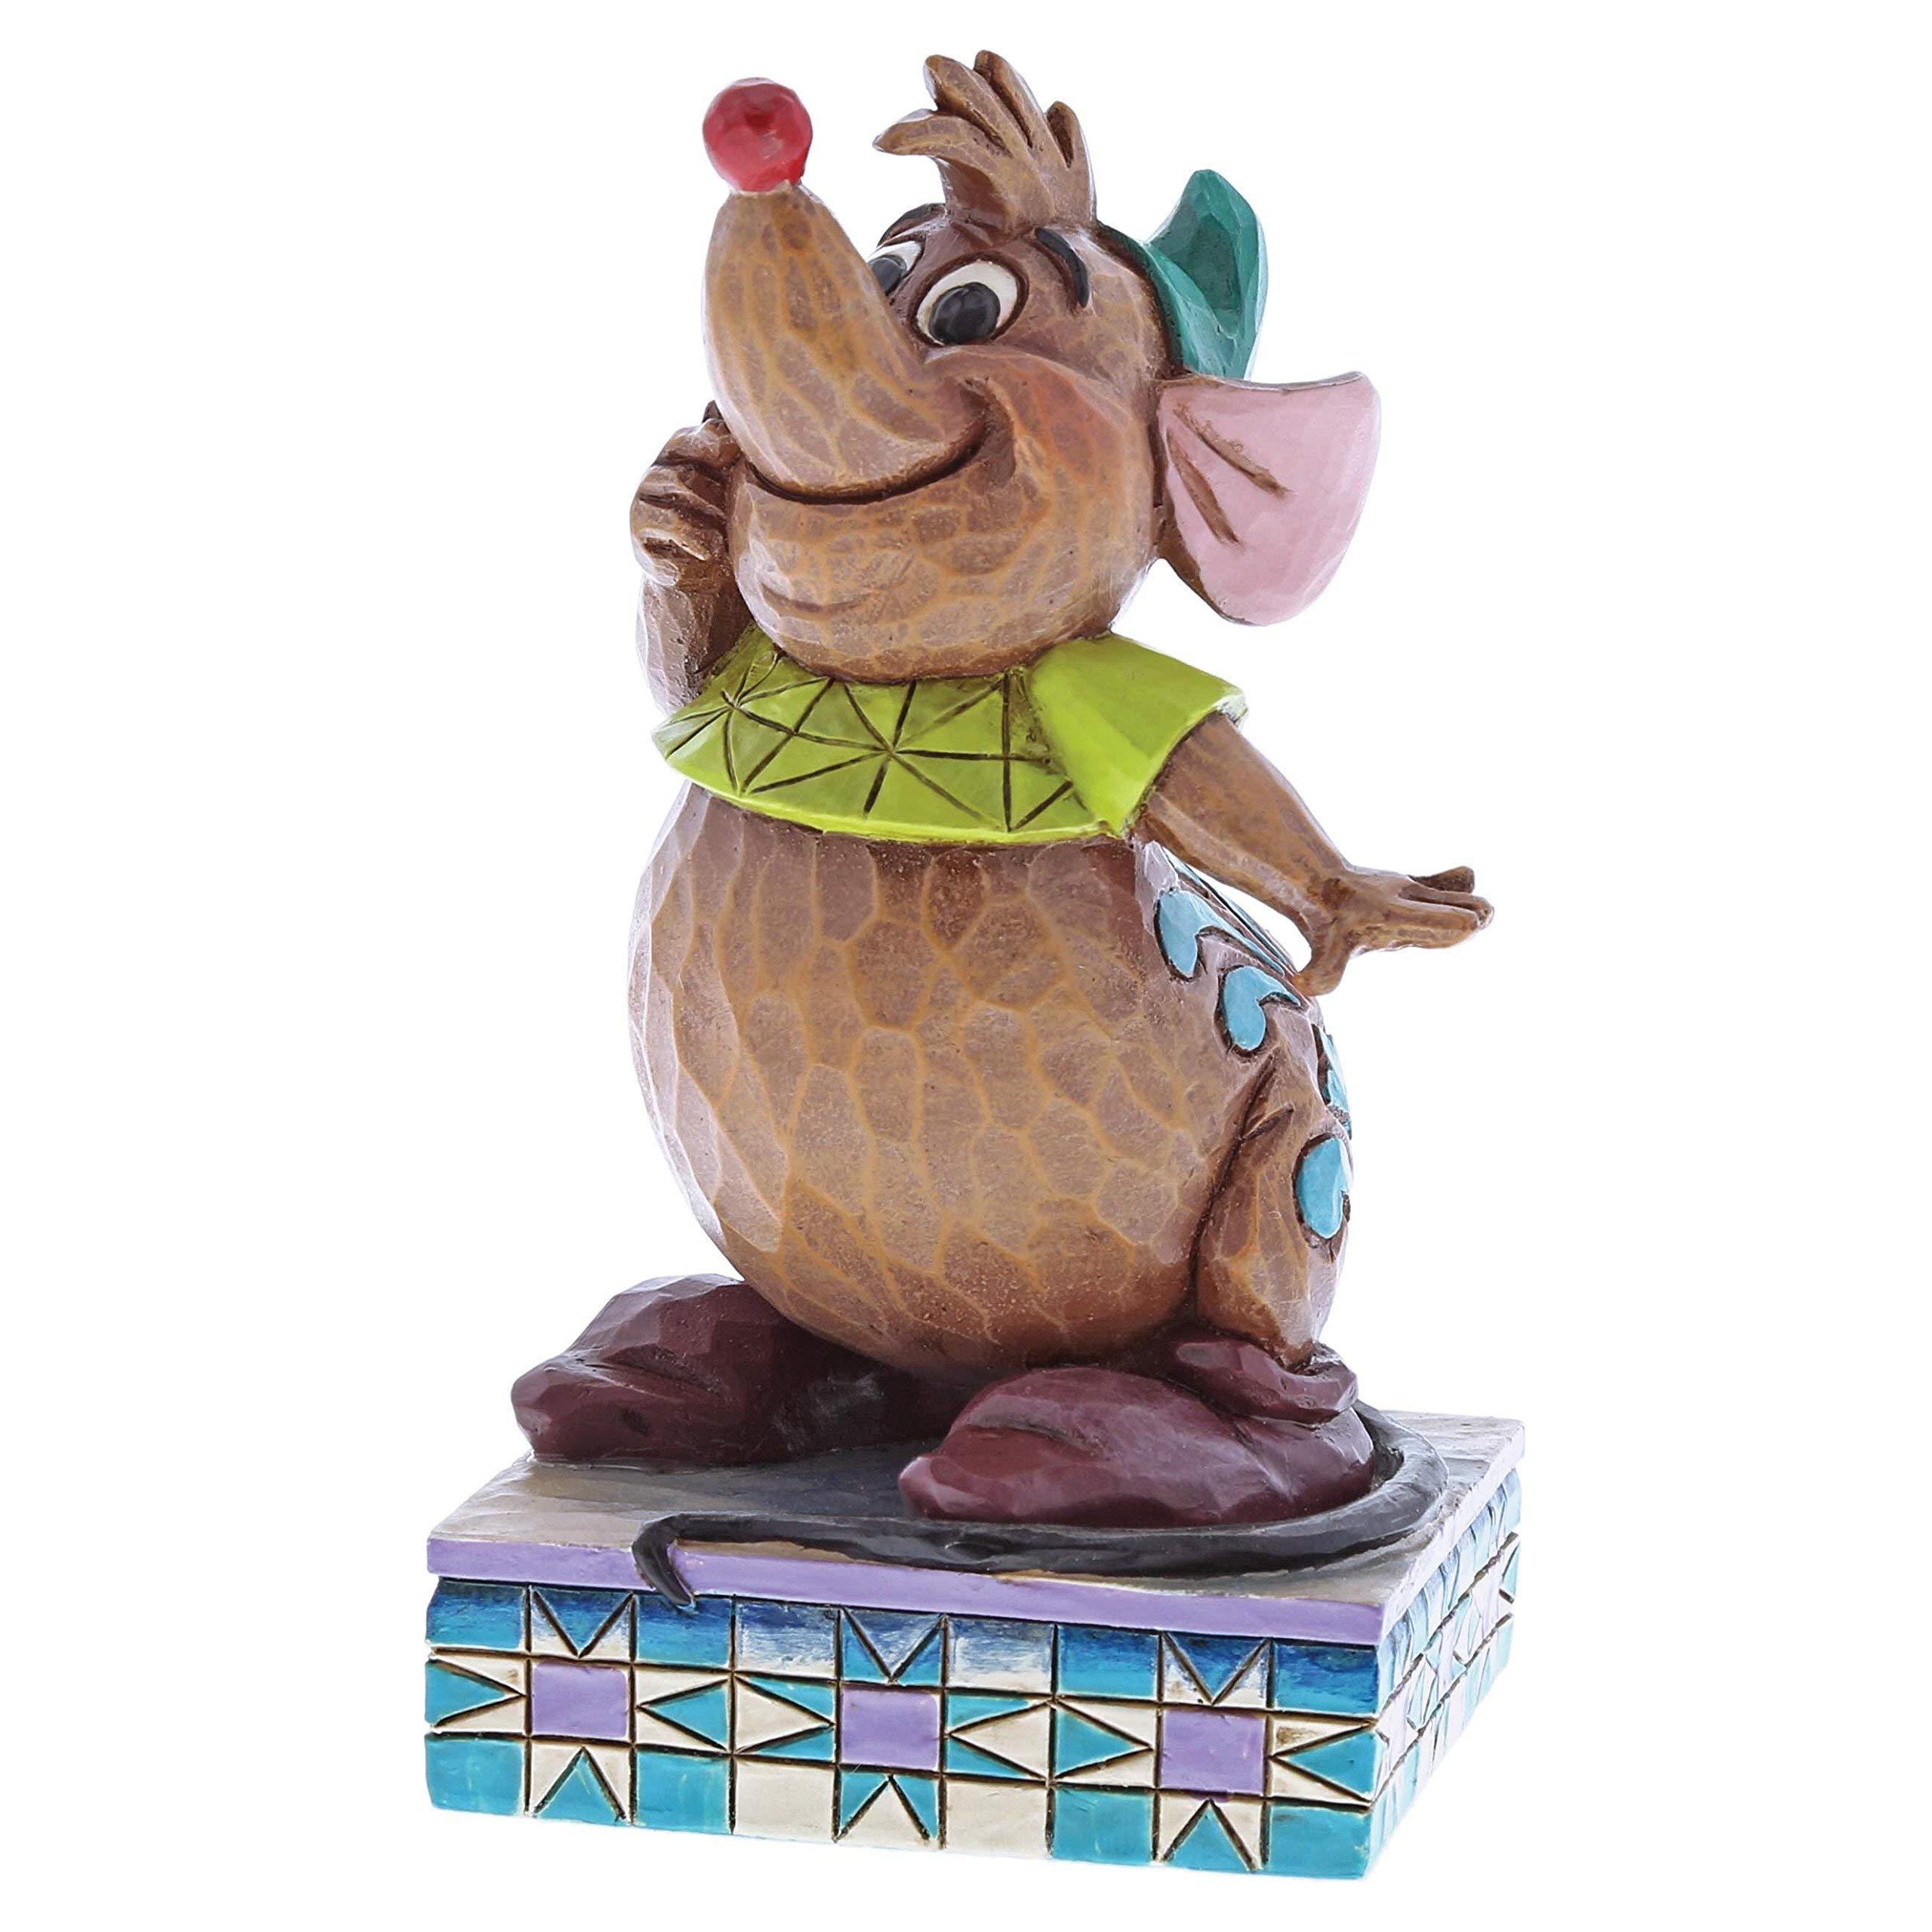 Disney Traditions 4059739 Cinderelly's Friend Gus Figurine 5.5 x 5.5 x 10 cm